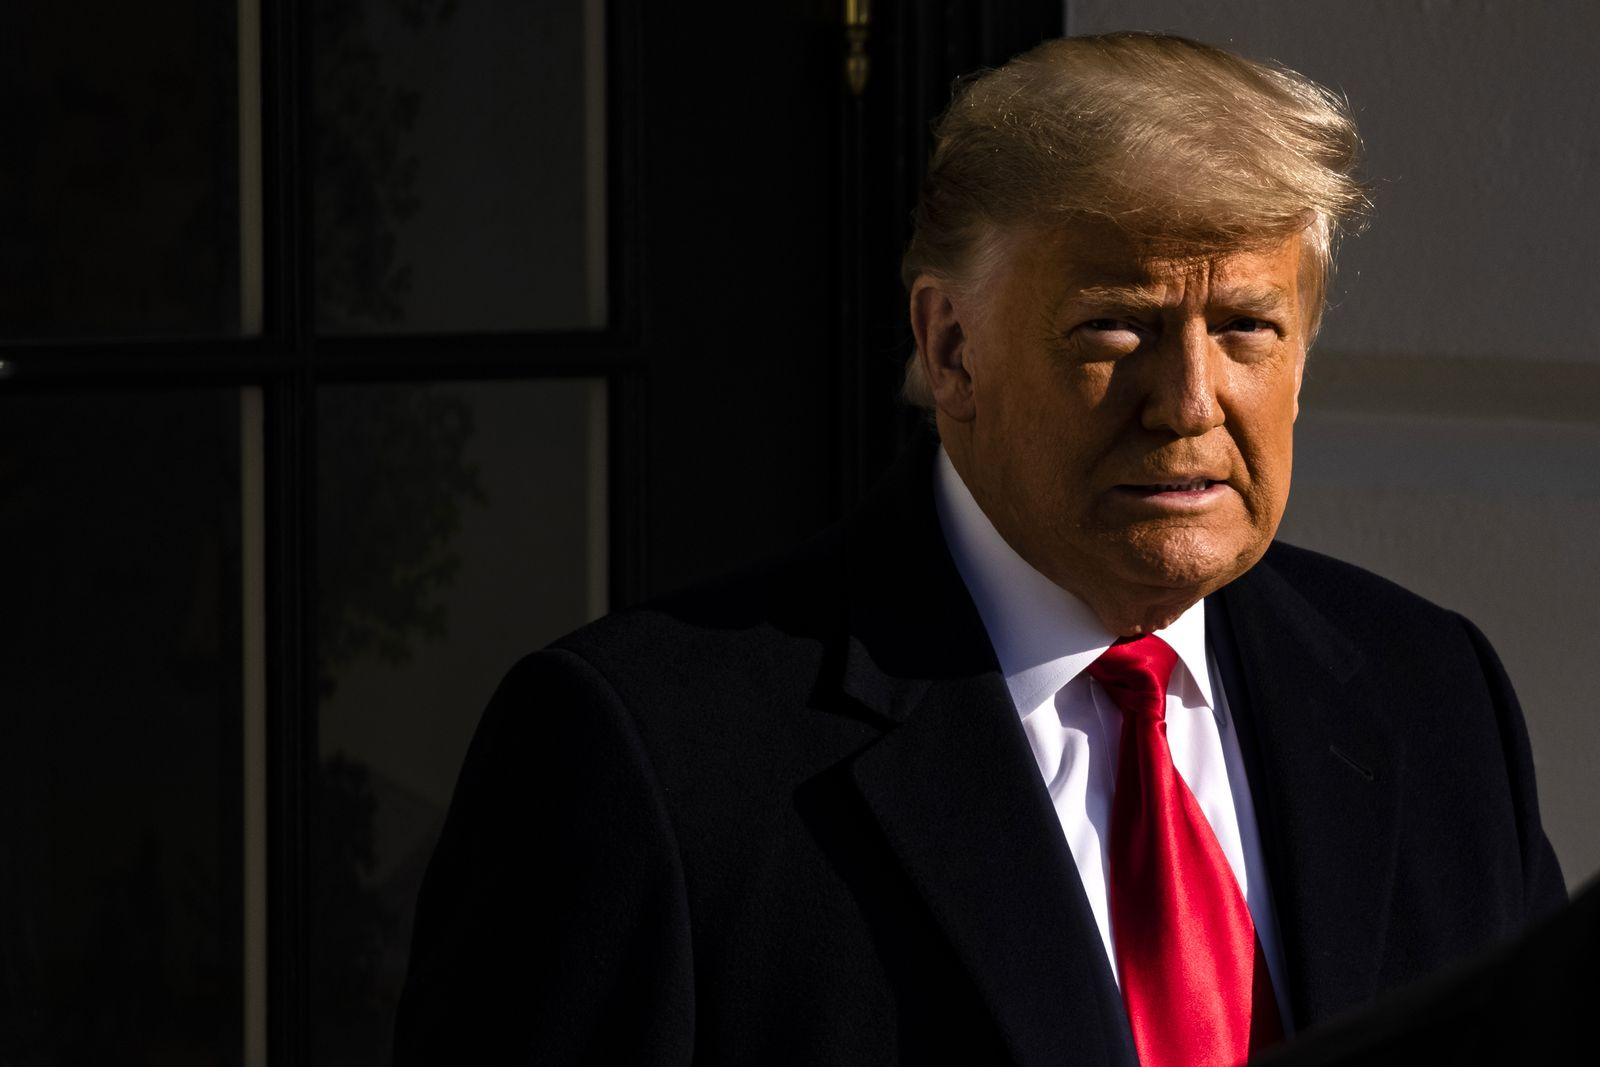 US President Trump departs for Texas, Washington, USA - 12 Jan 2021